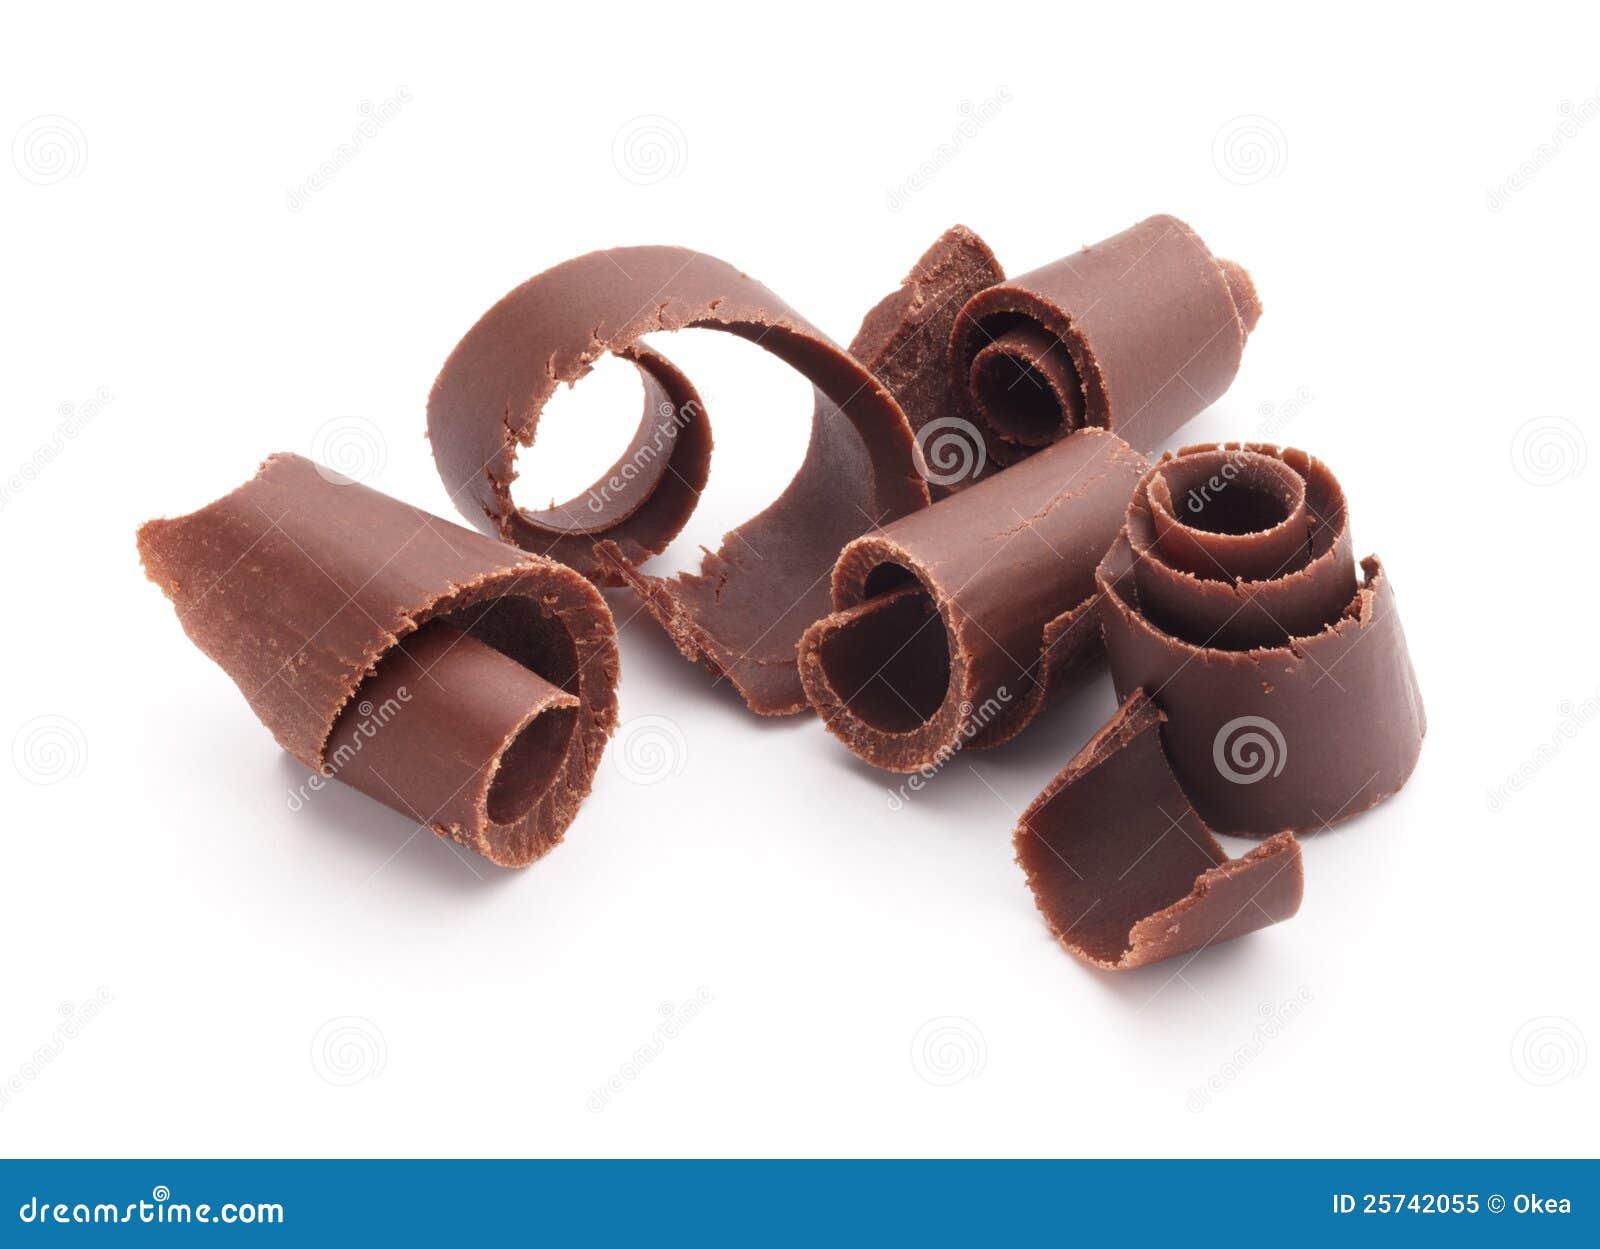 Schokoladenrotationen